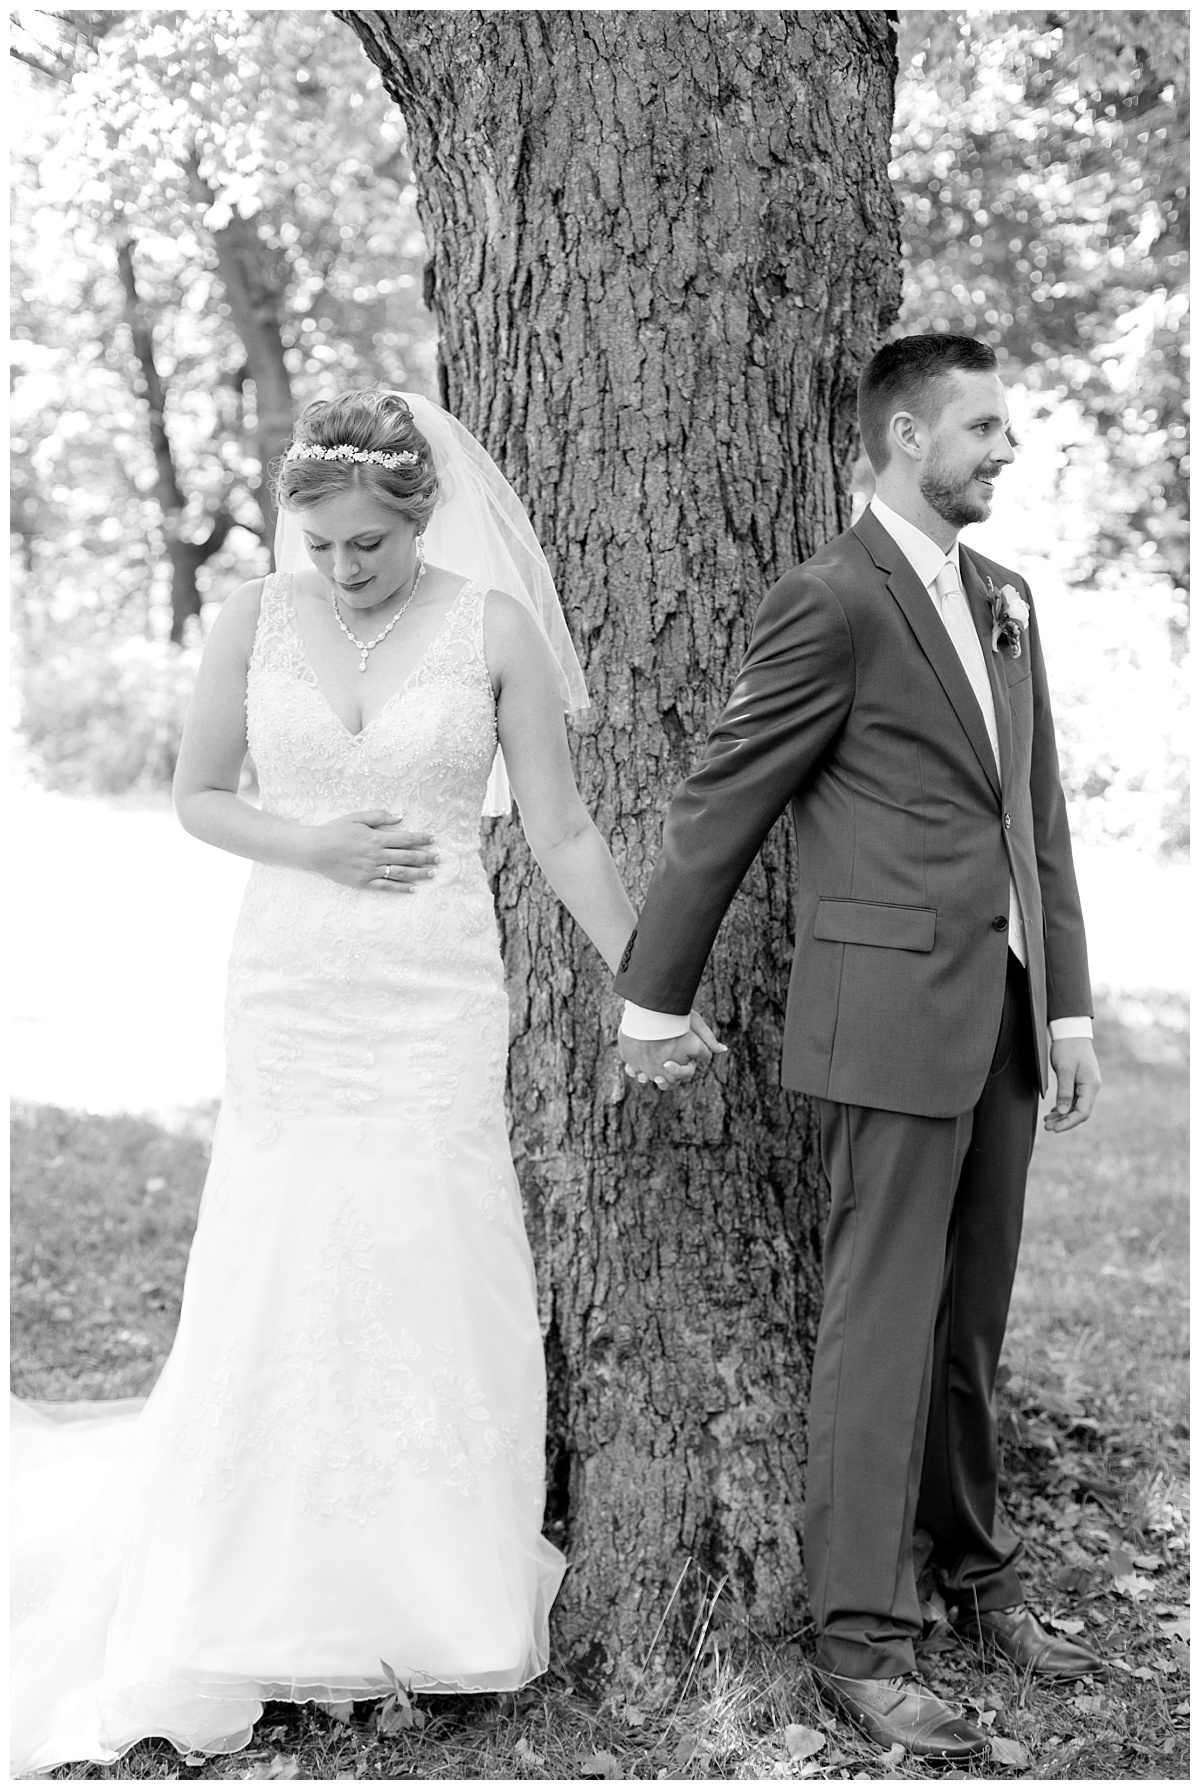 SW Minnesota Wedding Photographer | Bethany Melvin Photography